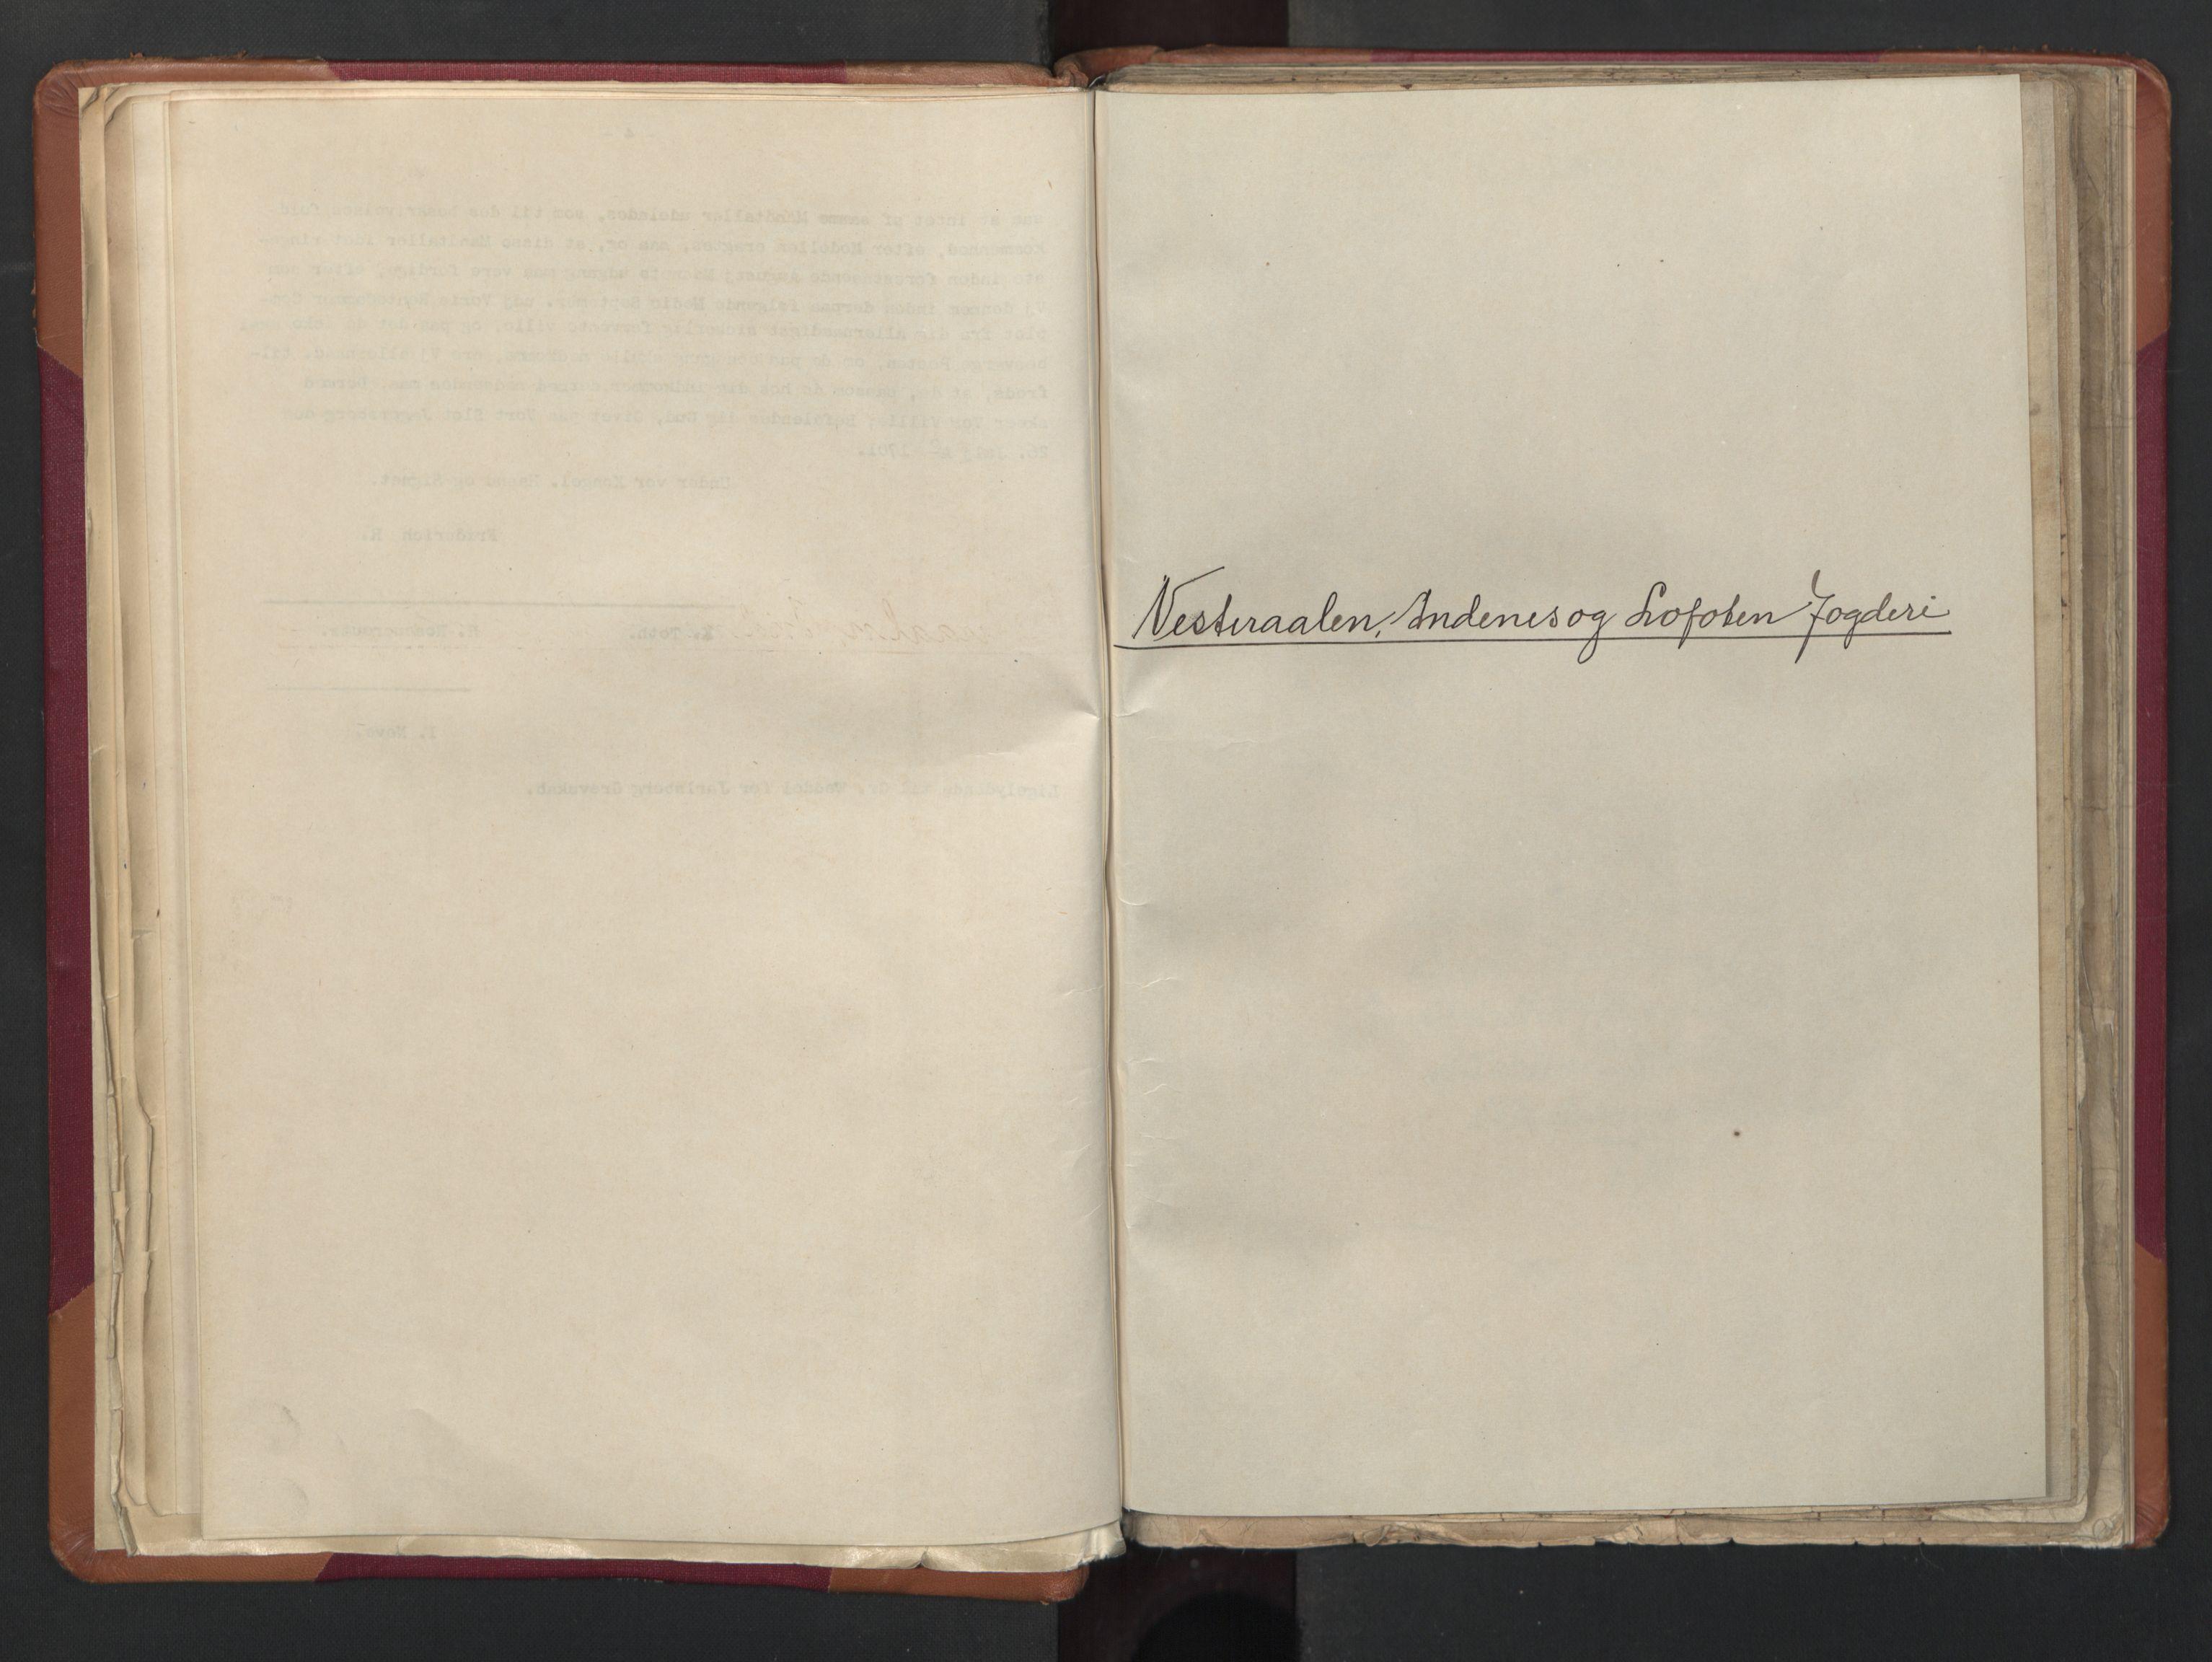 RA, Manntallet 1701, nr. 18: Vesterålen, Andenes og Lofoten fogderi, 1701, s. upaginert